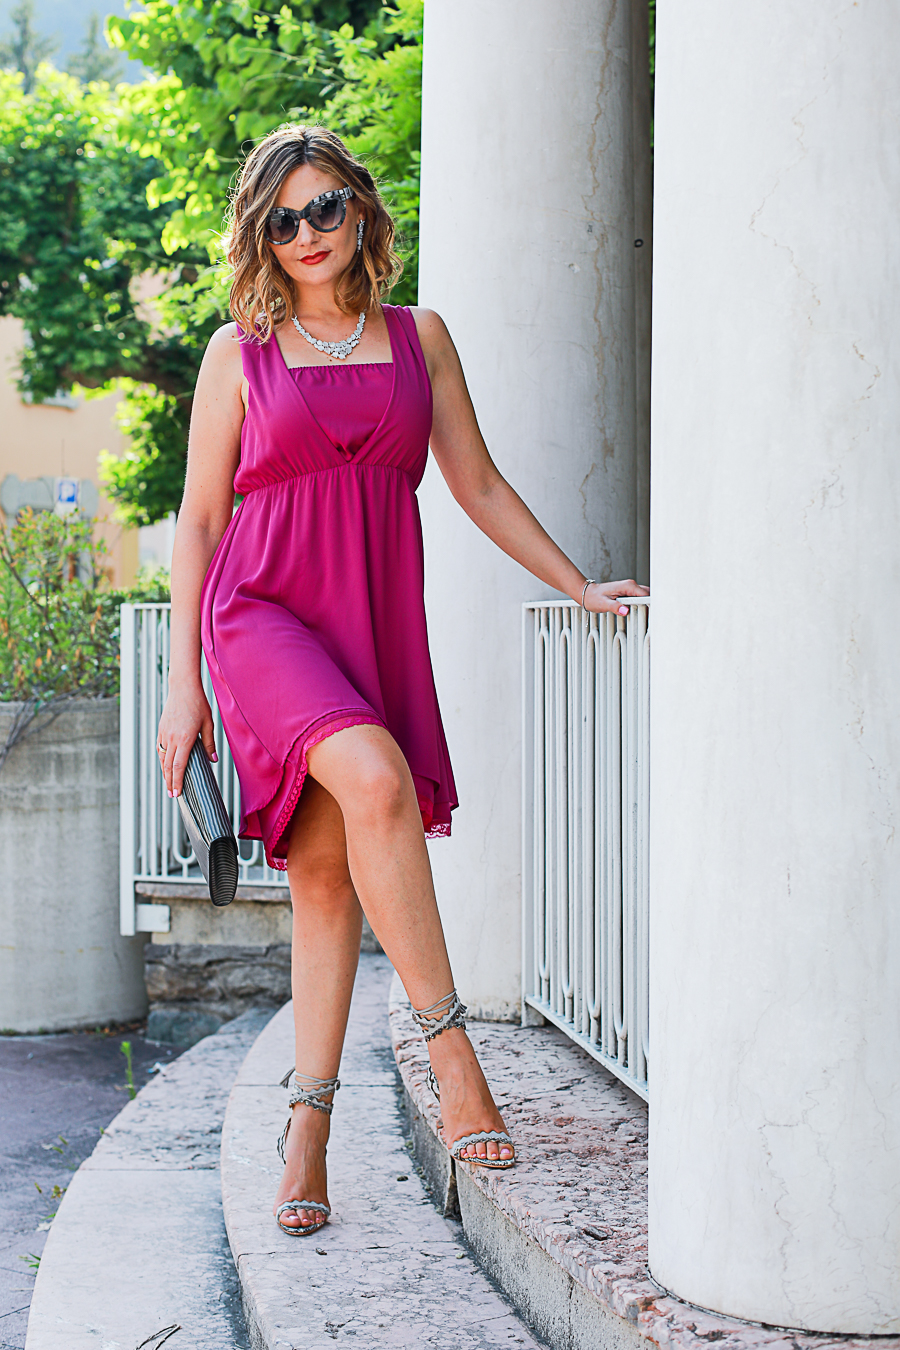 Valeria Arizzi on the Worldwide Fashion Blog